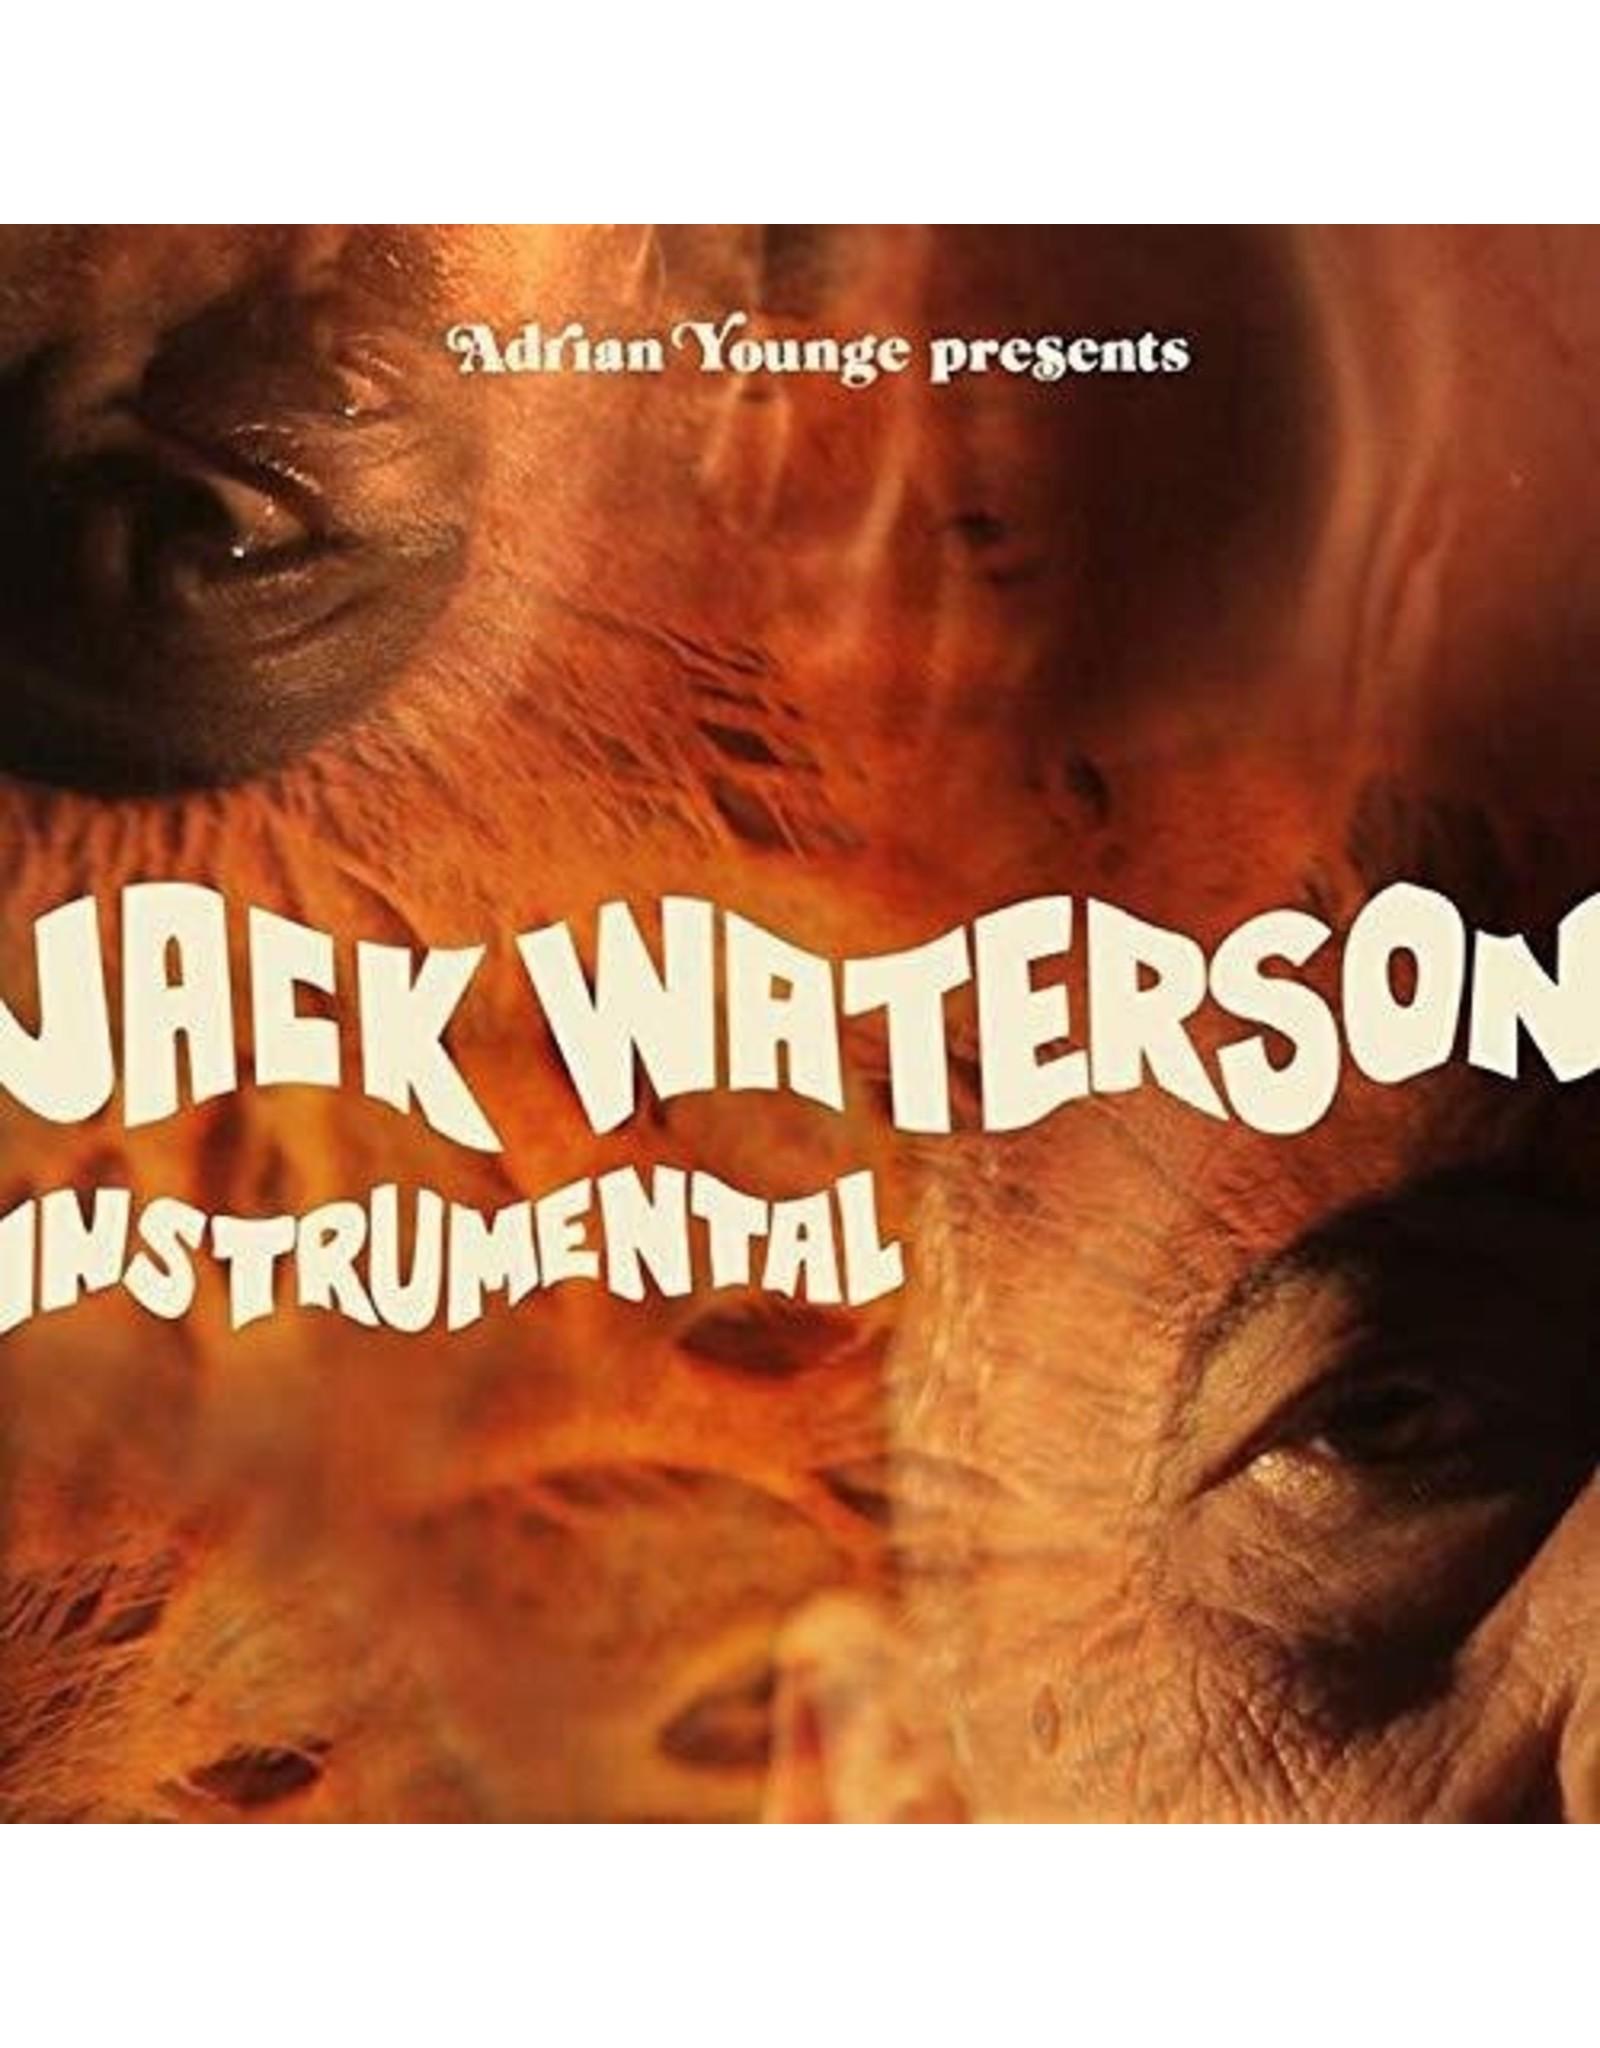 New Vinyl Adrian Younge - Jack Waterson Instrumentals LP